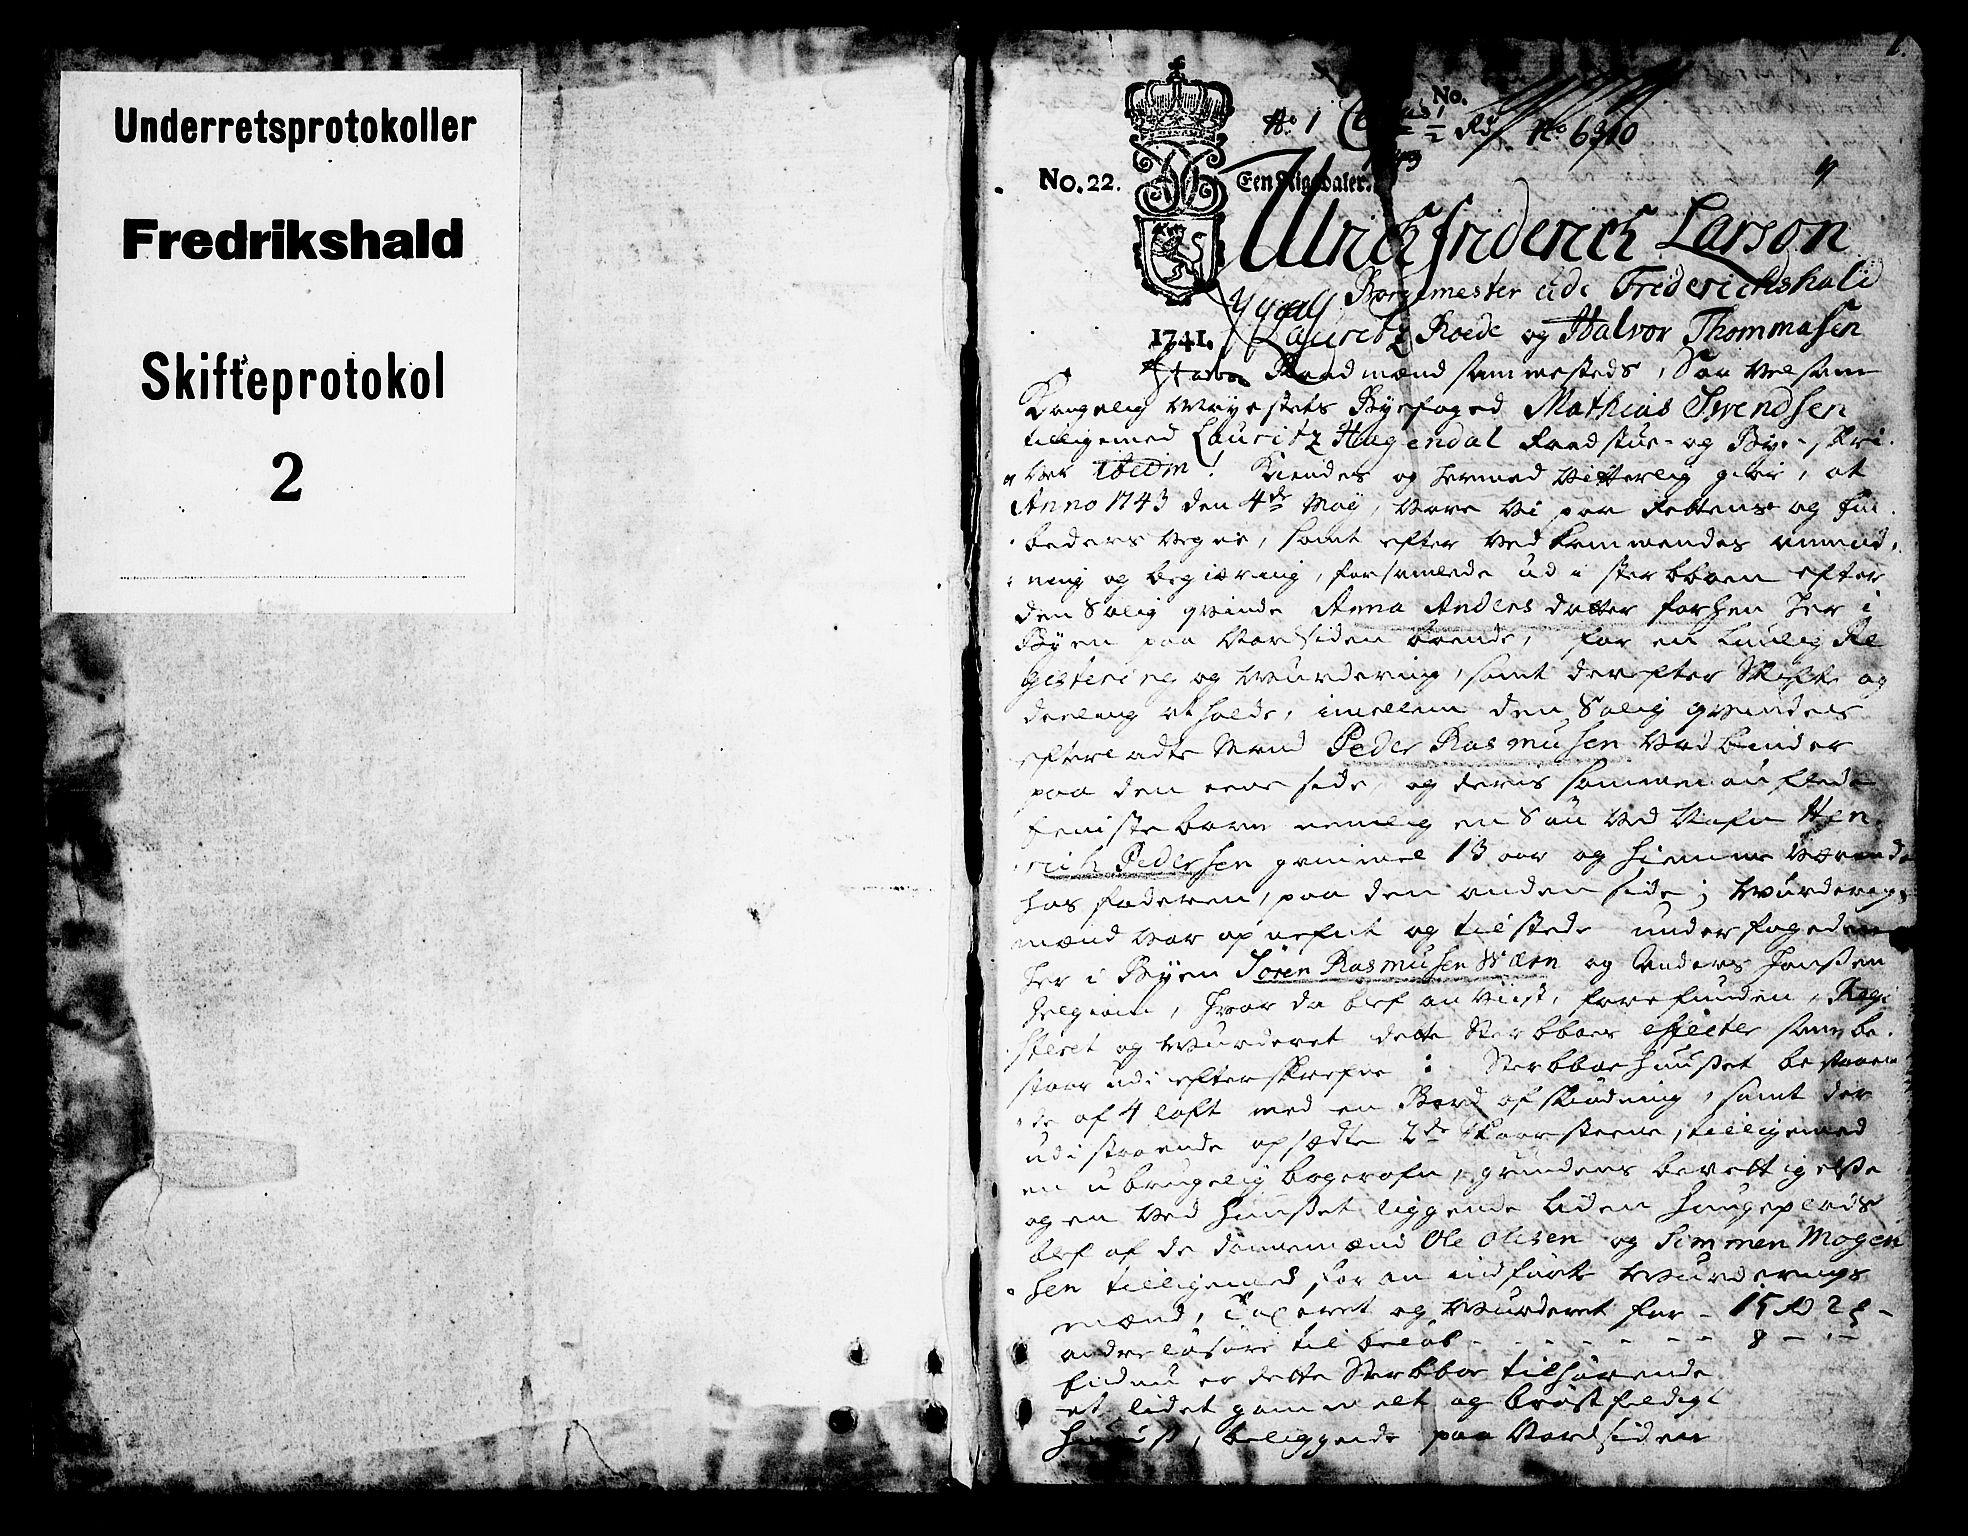 SAO, Halden byfogd, H/Hc/L0002: Skifteprotokoll, 1743-1753, s. 0b-1a